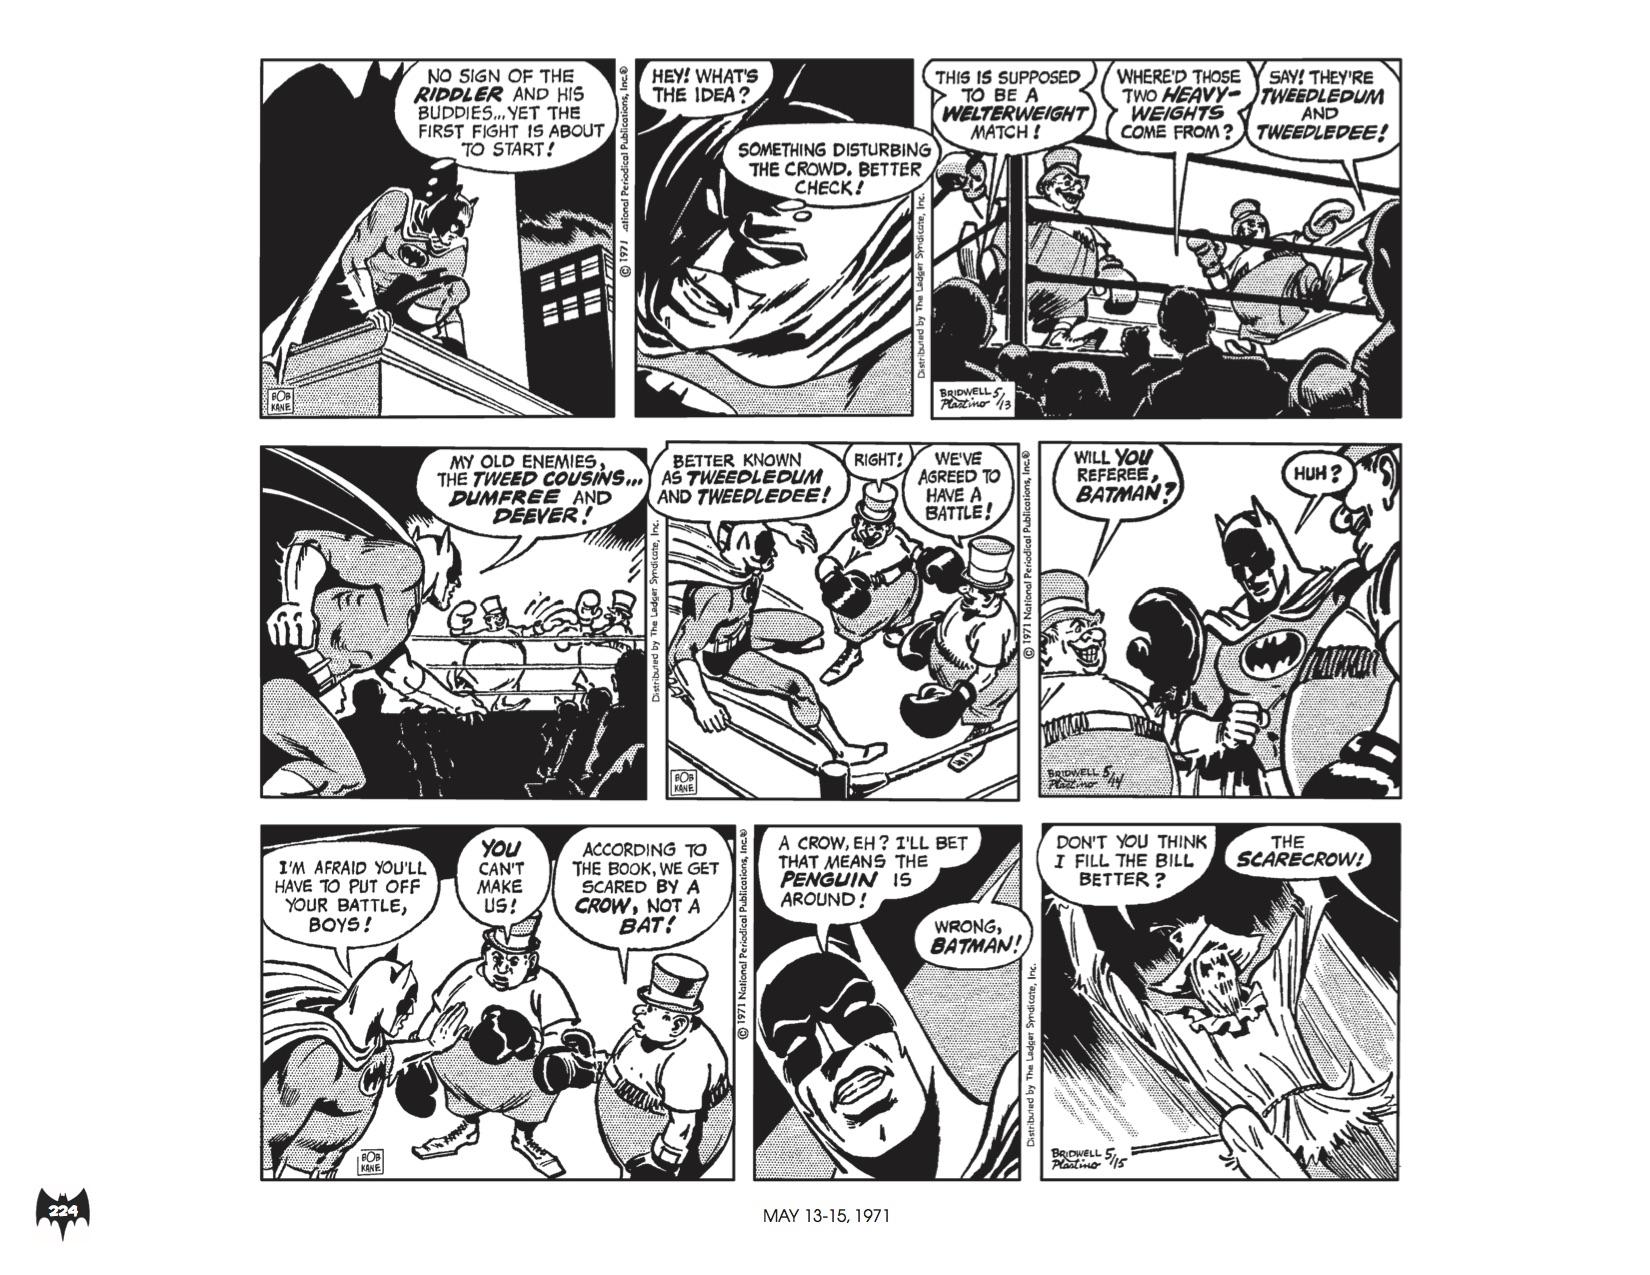 batman_silveragenewspaper_v3-lo224